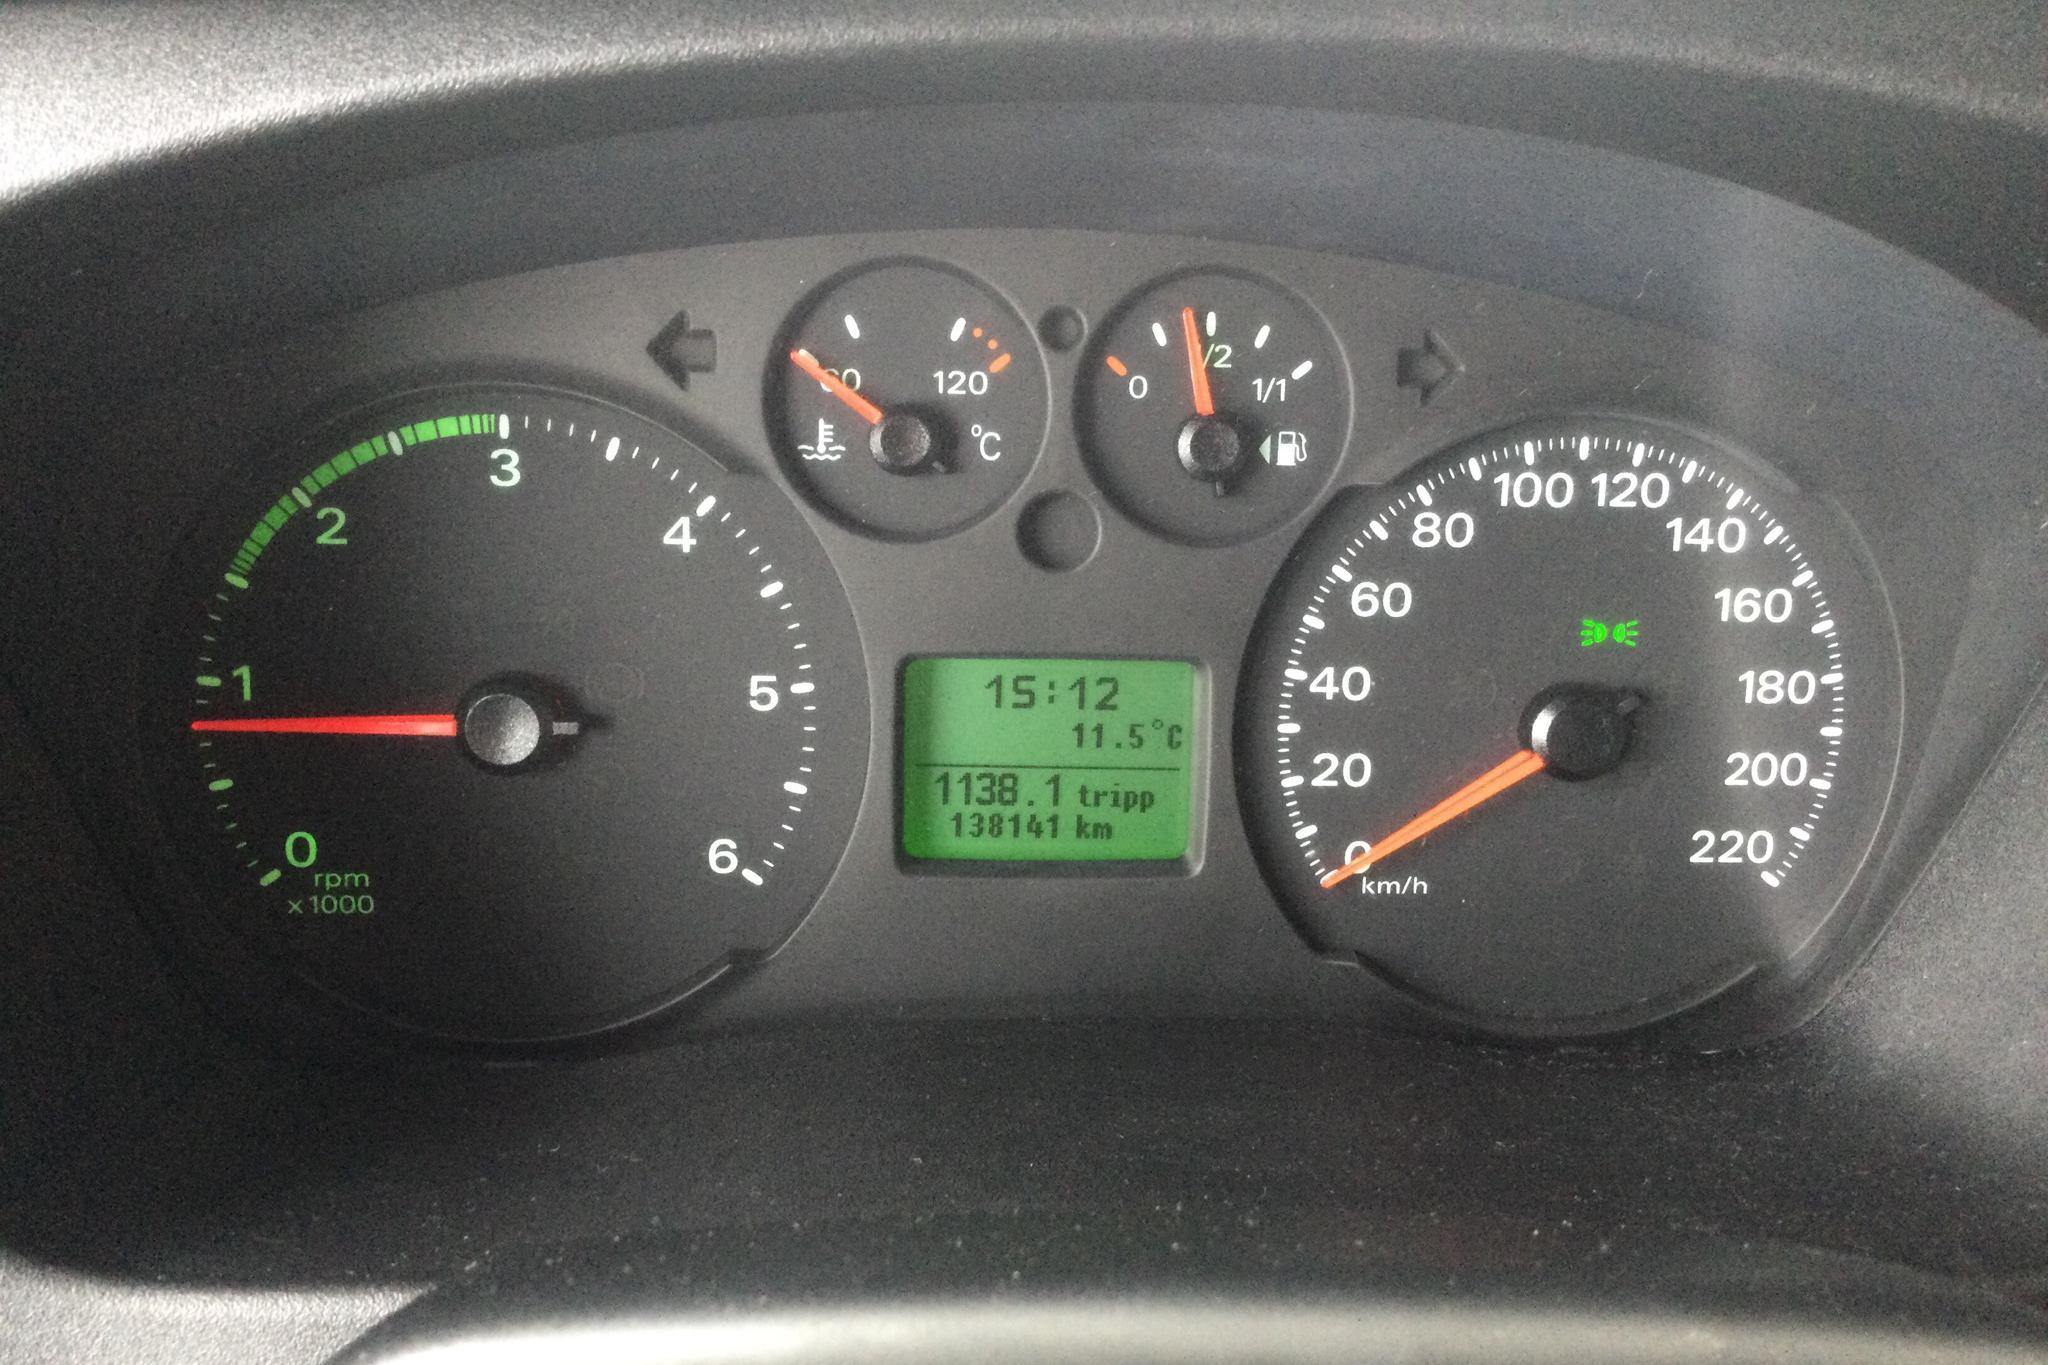 Ci Carioca 599 Husbil - 138 140 km - Manual - white - 2007